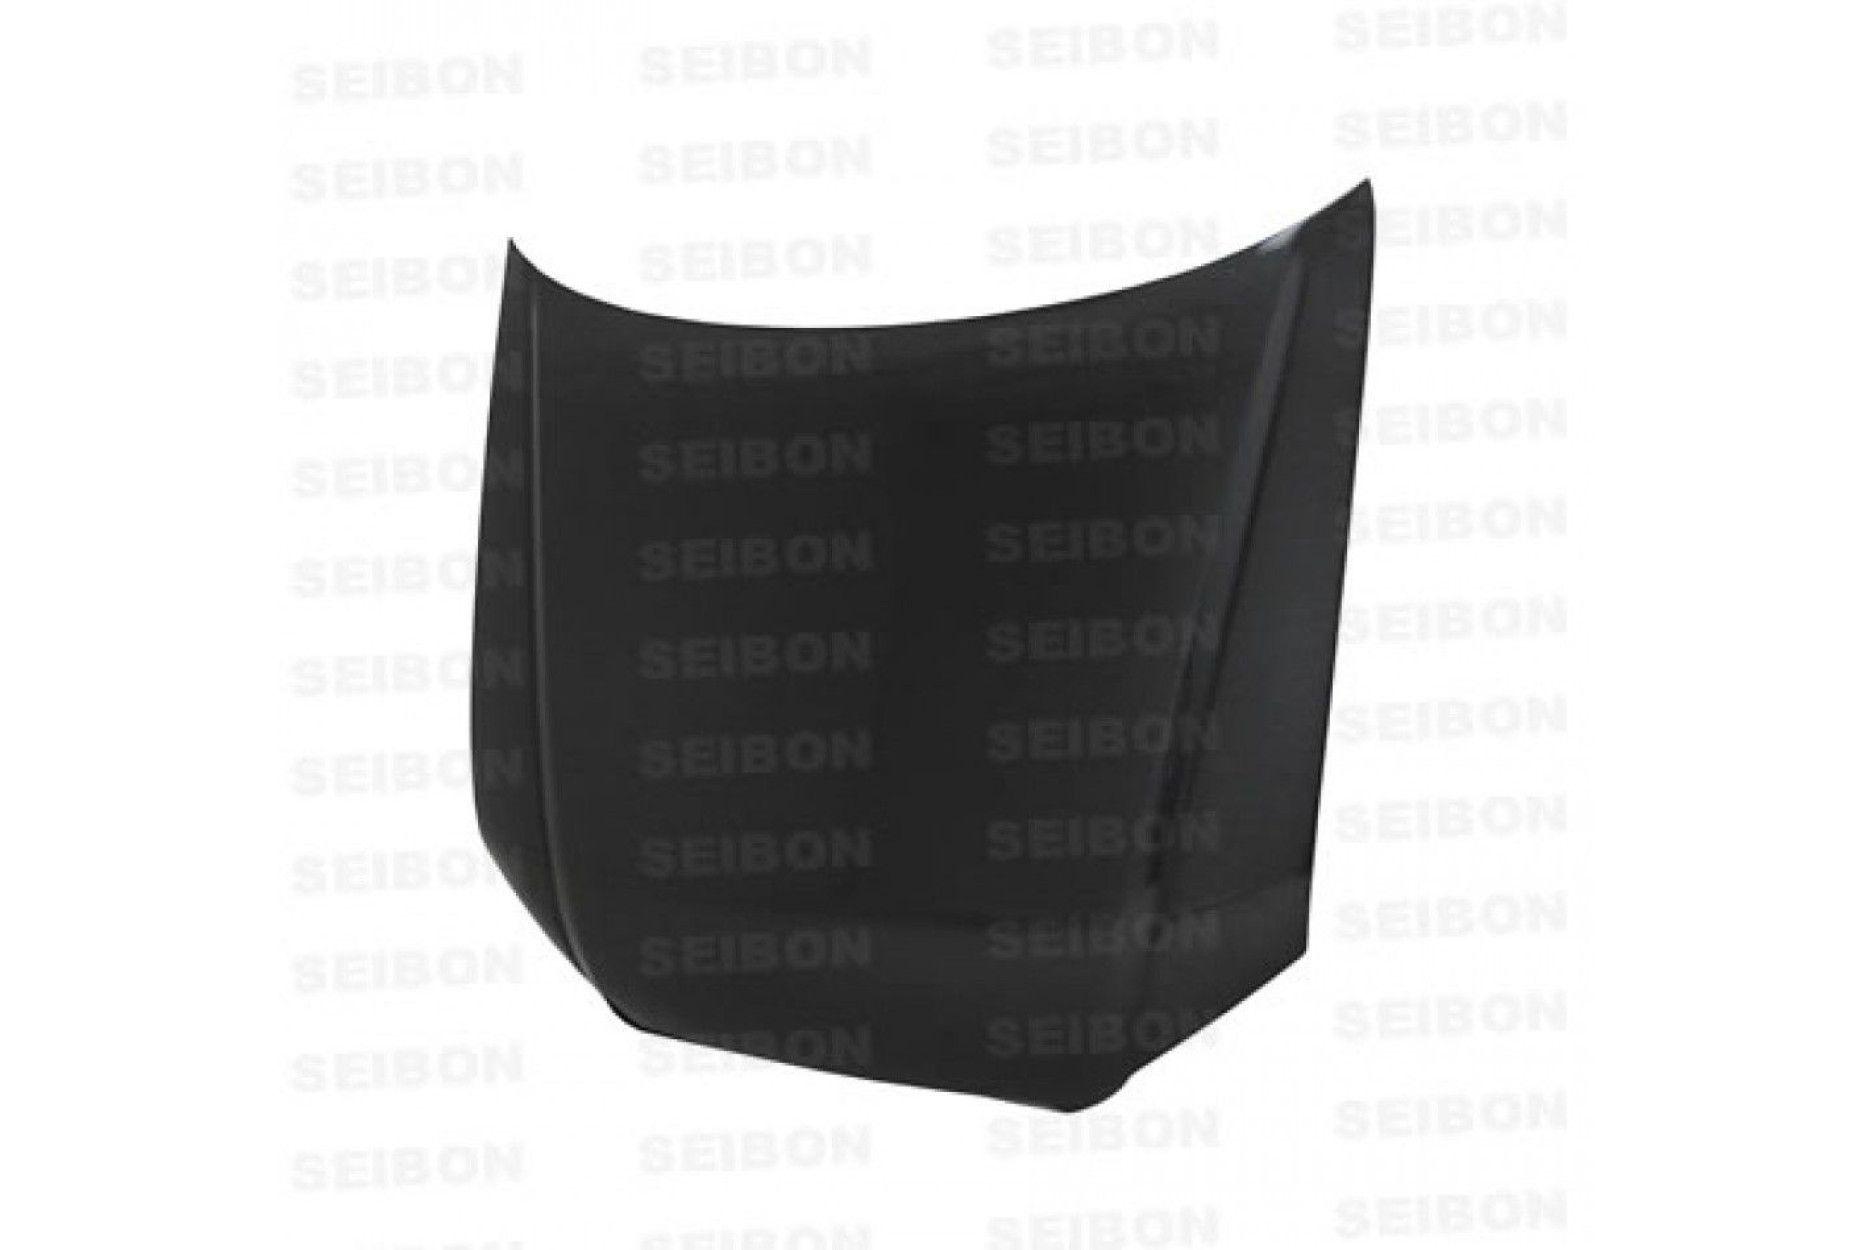 Seibon carbon hood for AUDI A4 B7 sedan and wagon 2006 - 2007 OE-Style